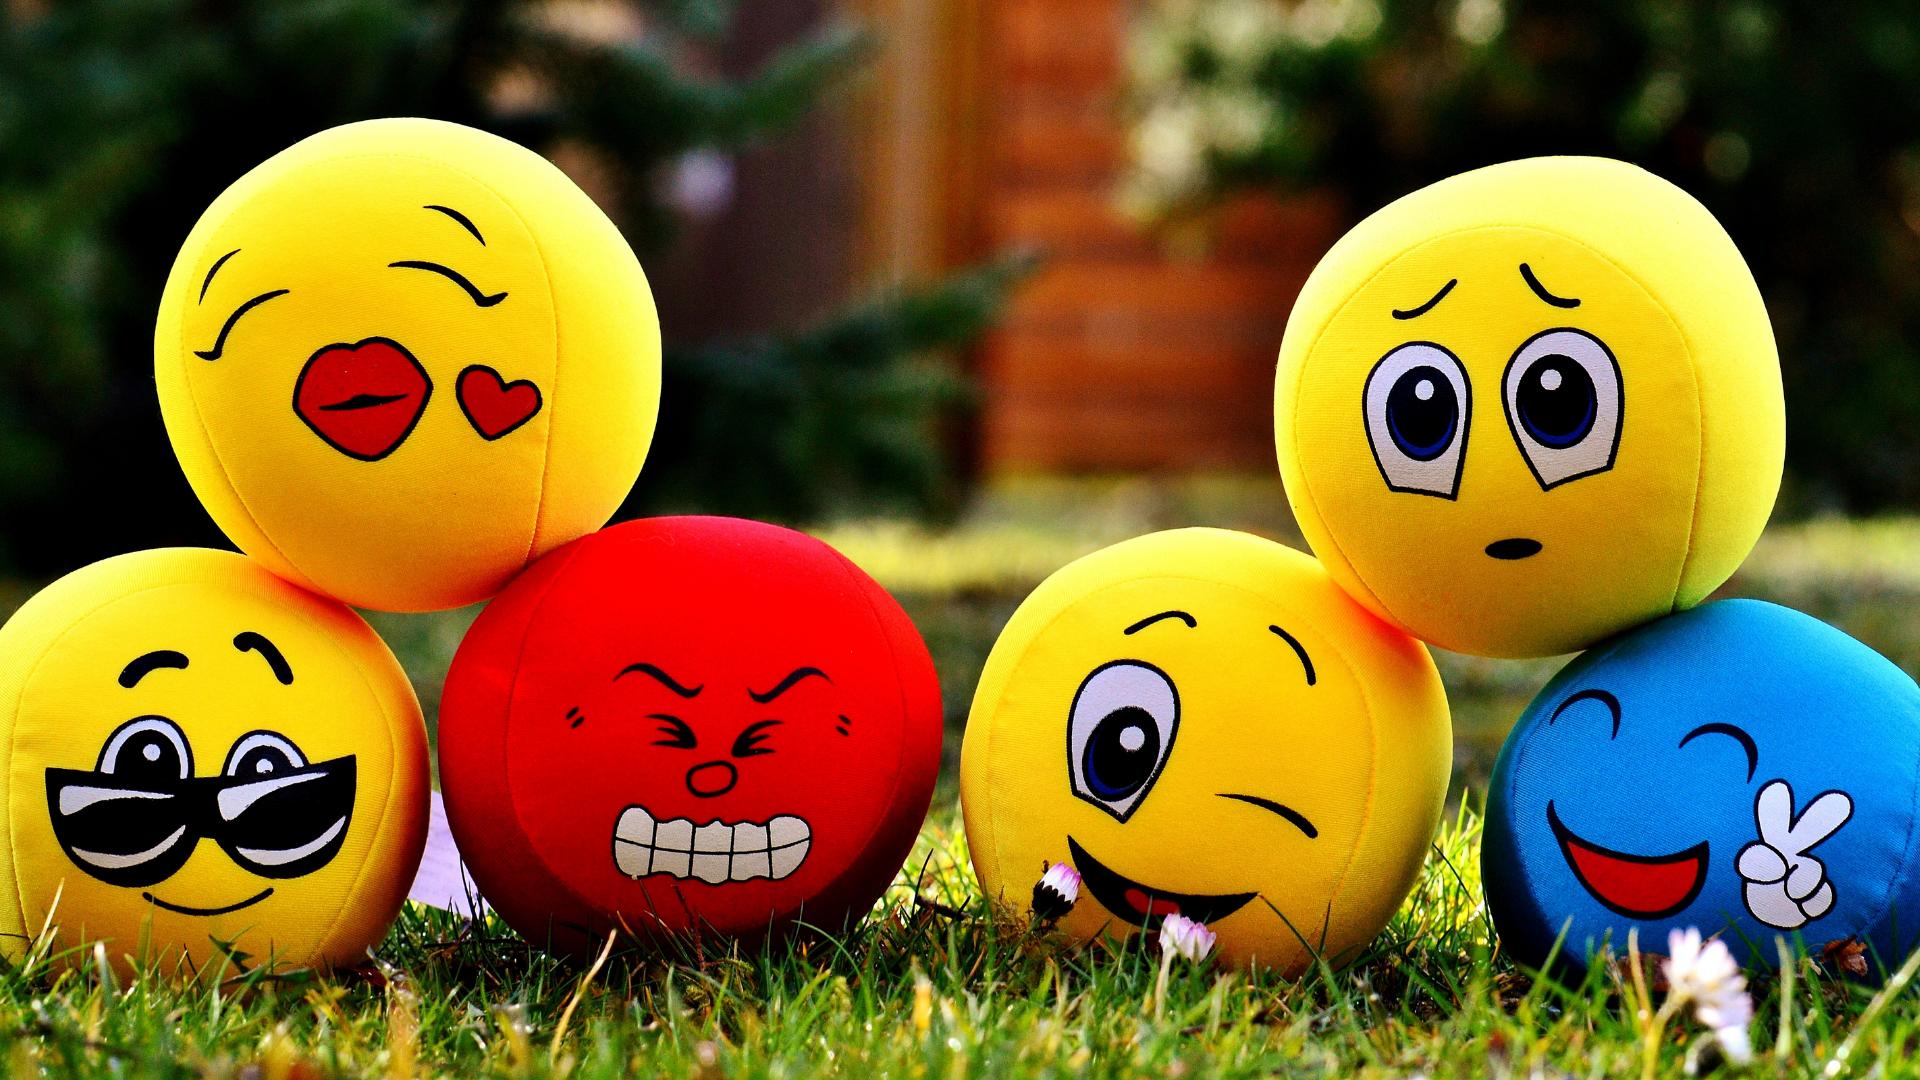 Emoce a stres jako podklad pro nemoci